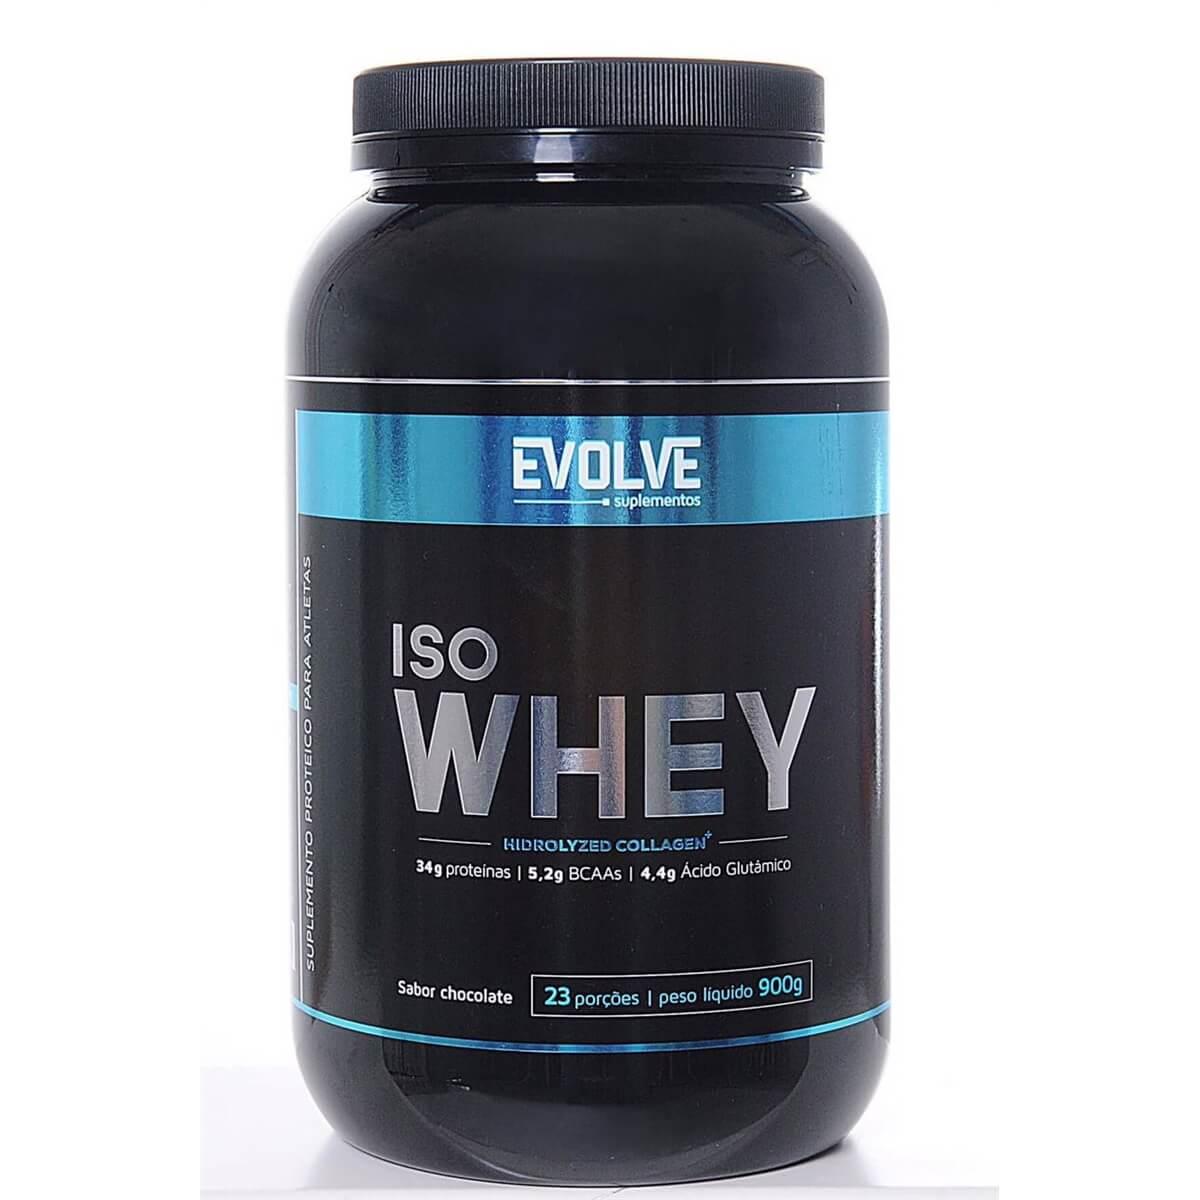 ISO Whey - 900g - Evolve Suplementos